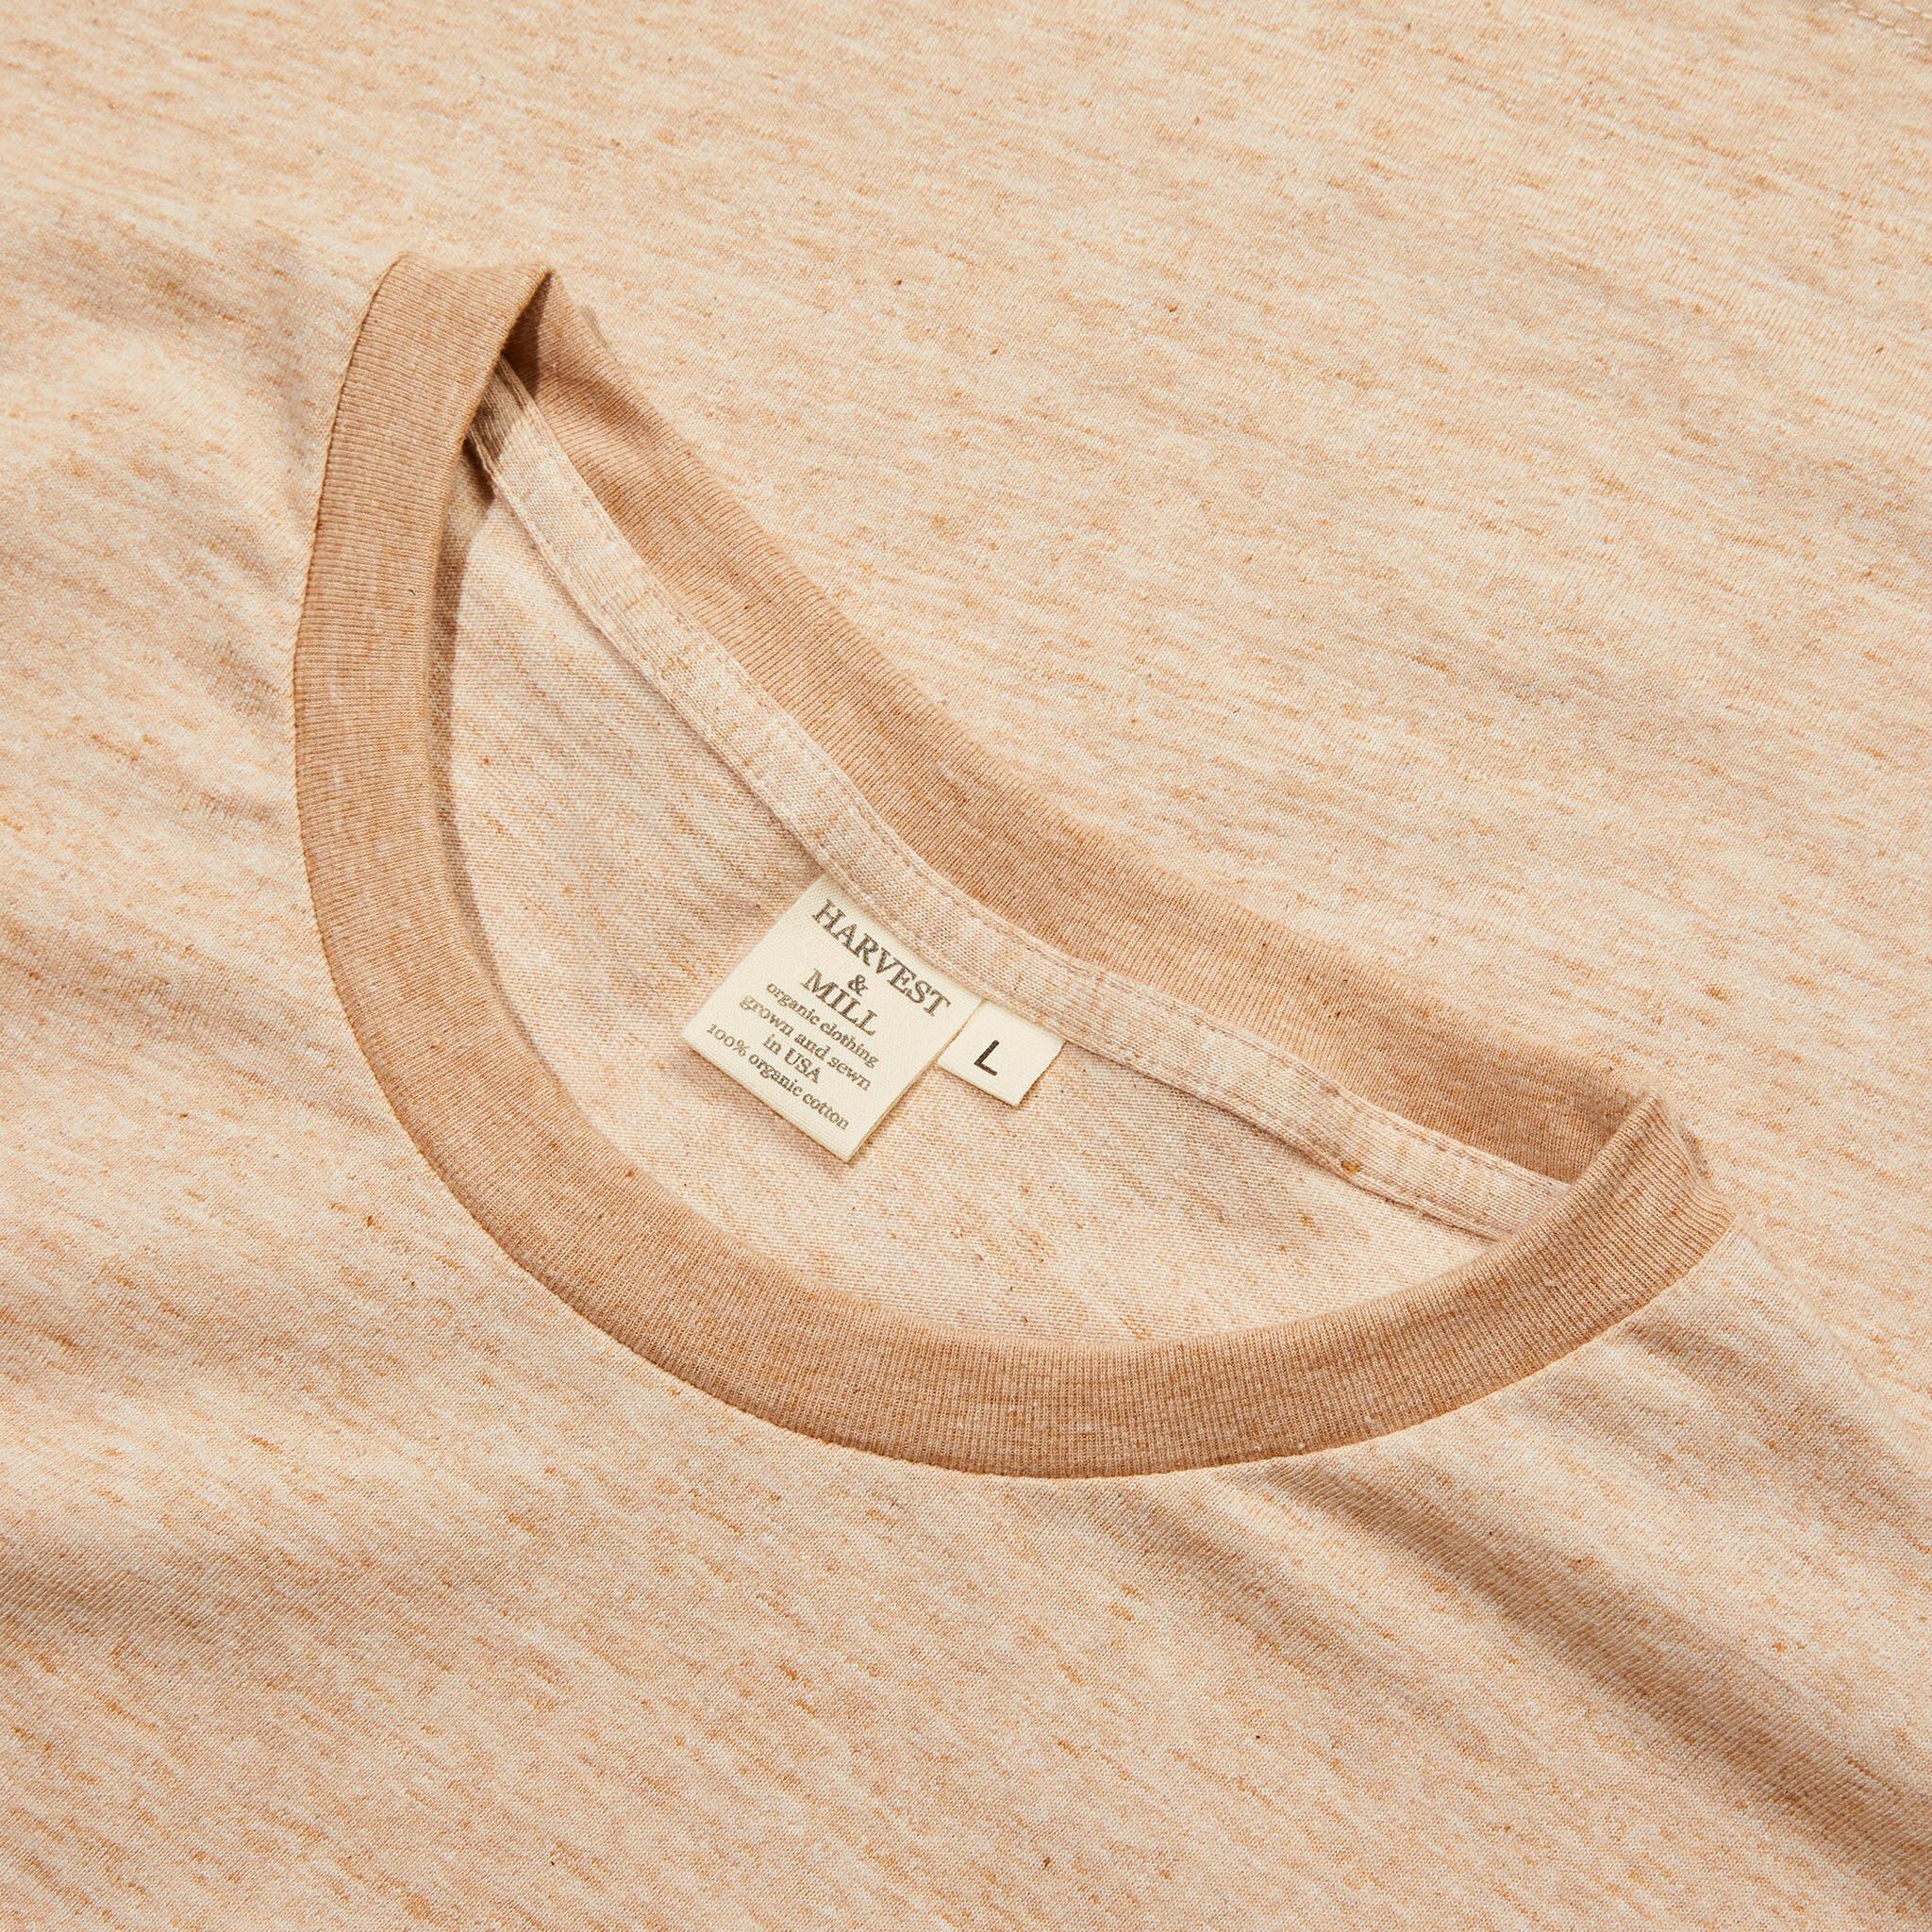 regenerative t-shirts for women